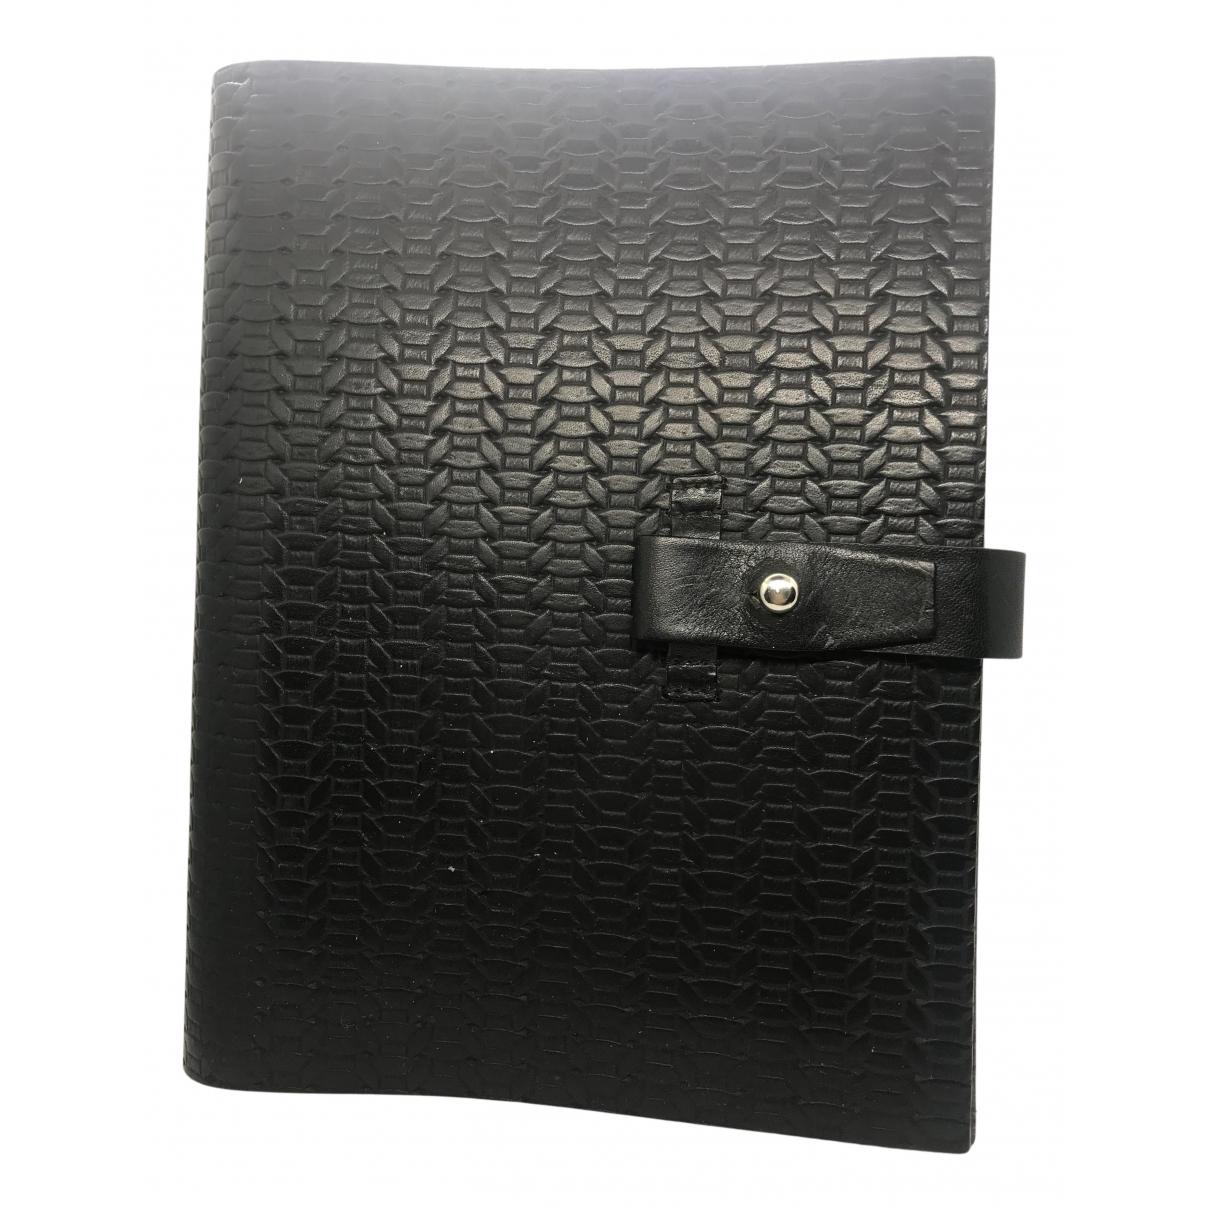 Ag Spalding & Bros N Black Leather Home decor for Life & Living N